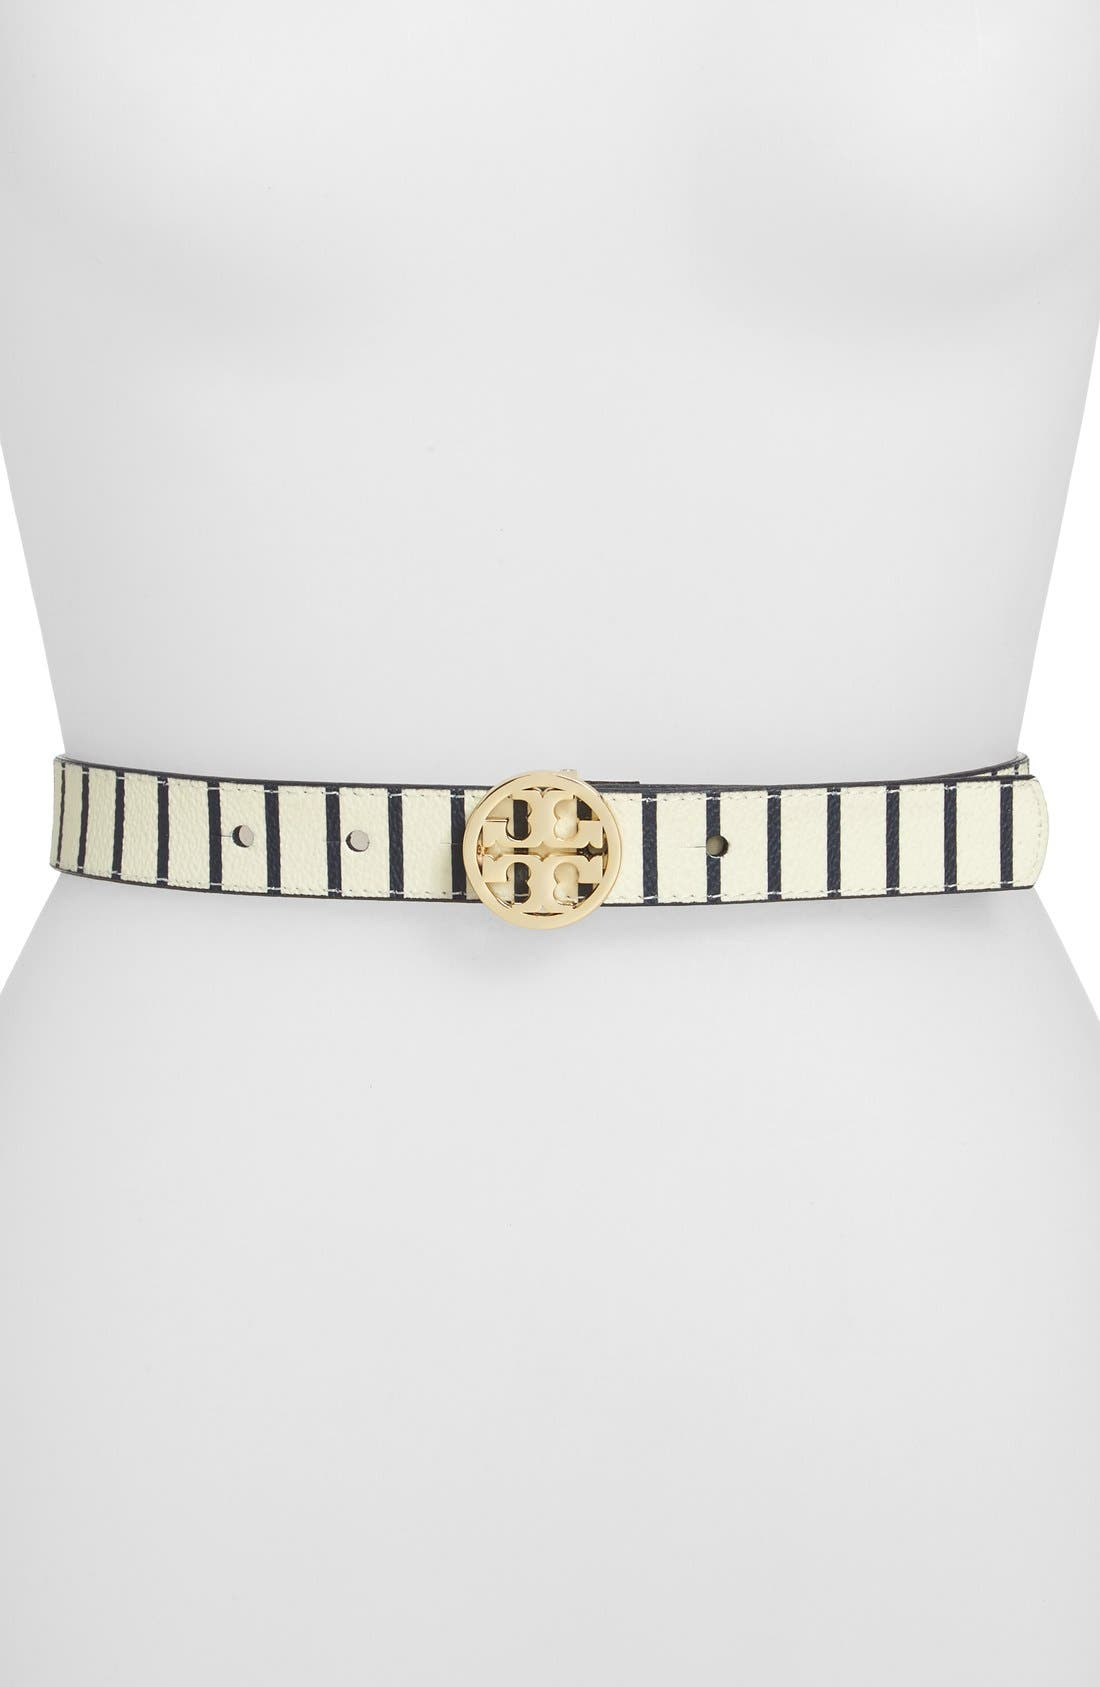 Main Image - Tory Burch 'Fleet Stripe' Leather Belt